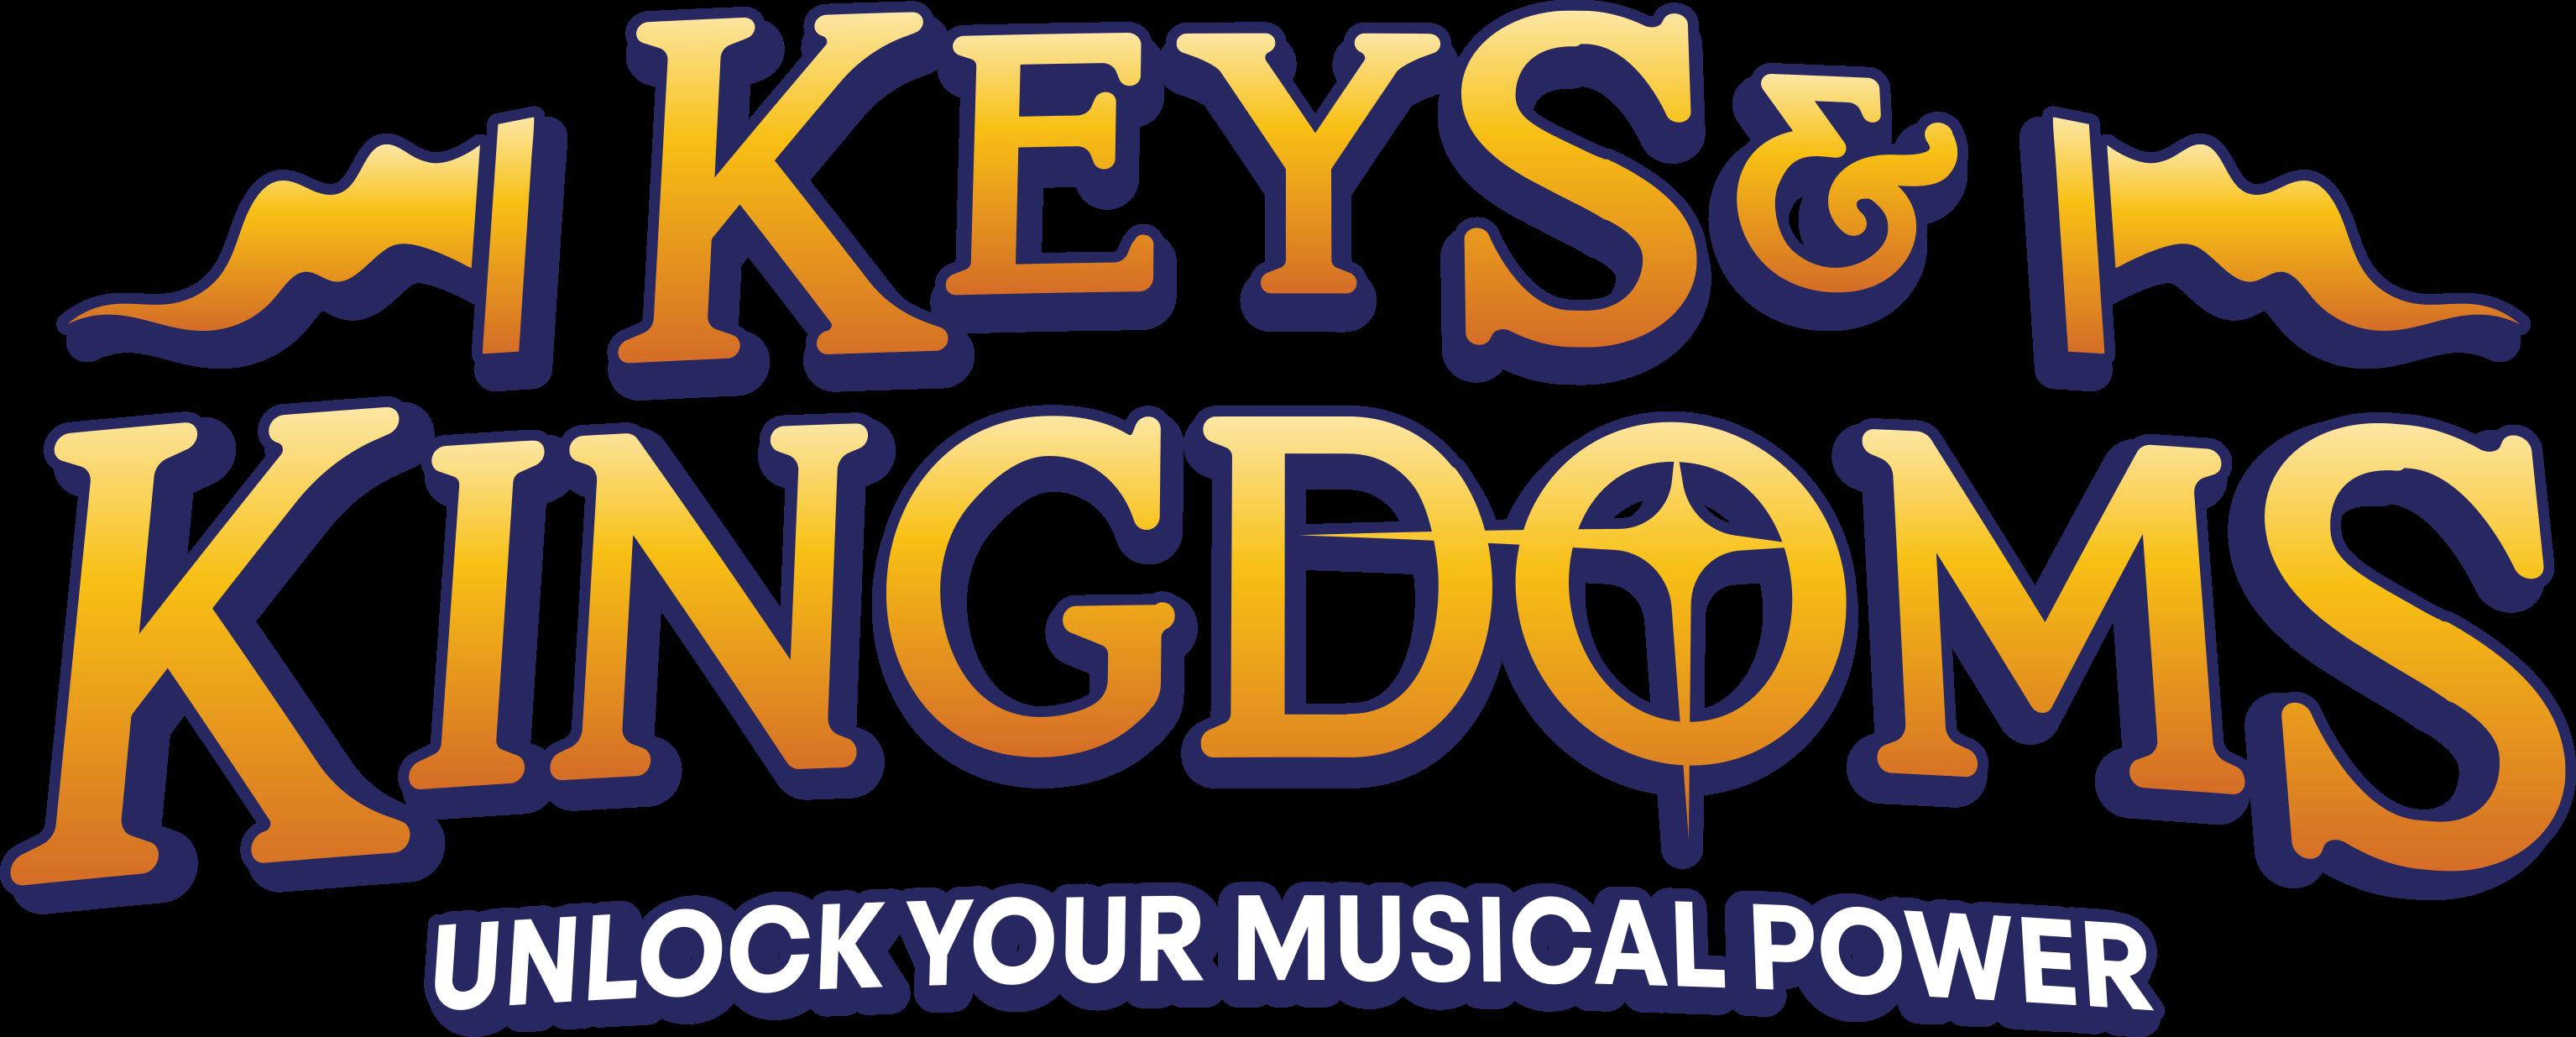 keyskingdoms